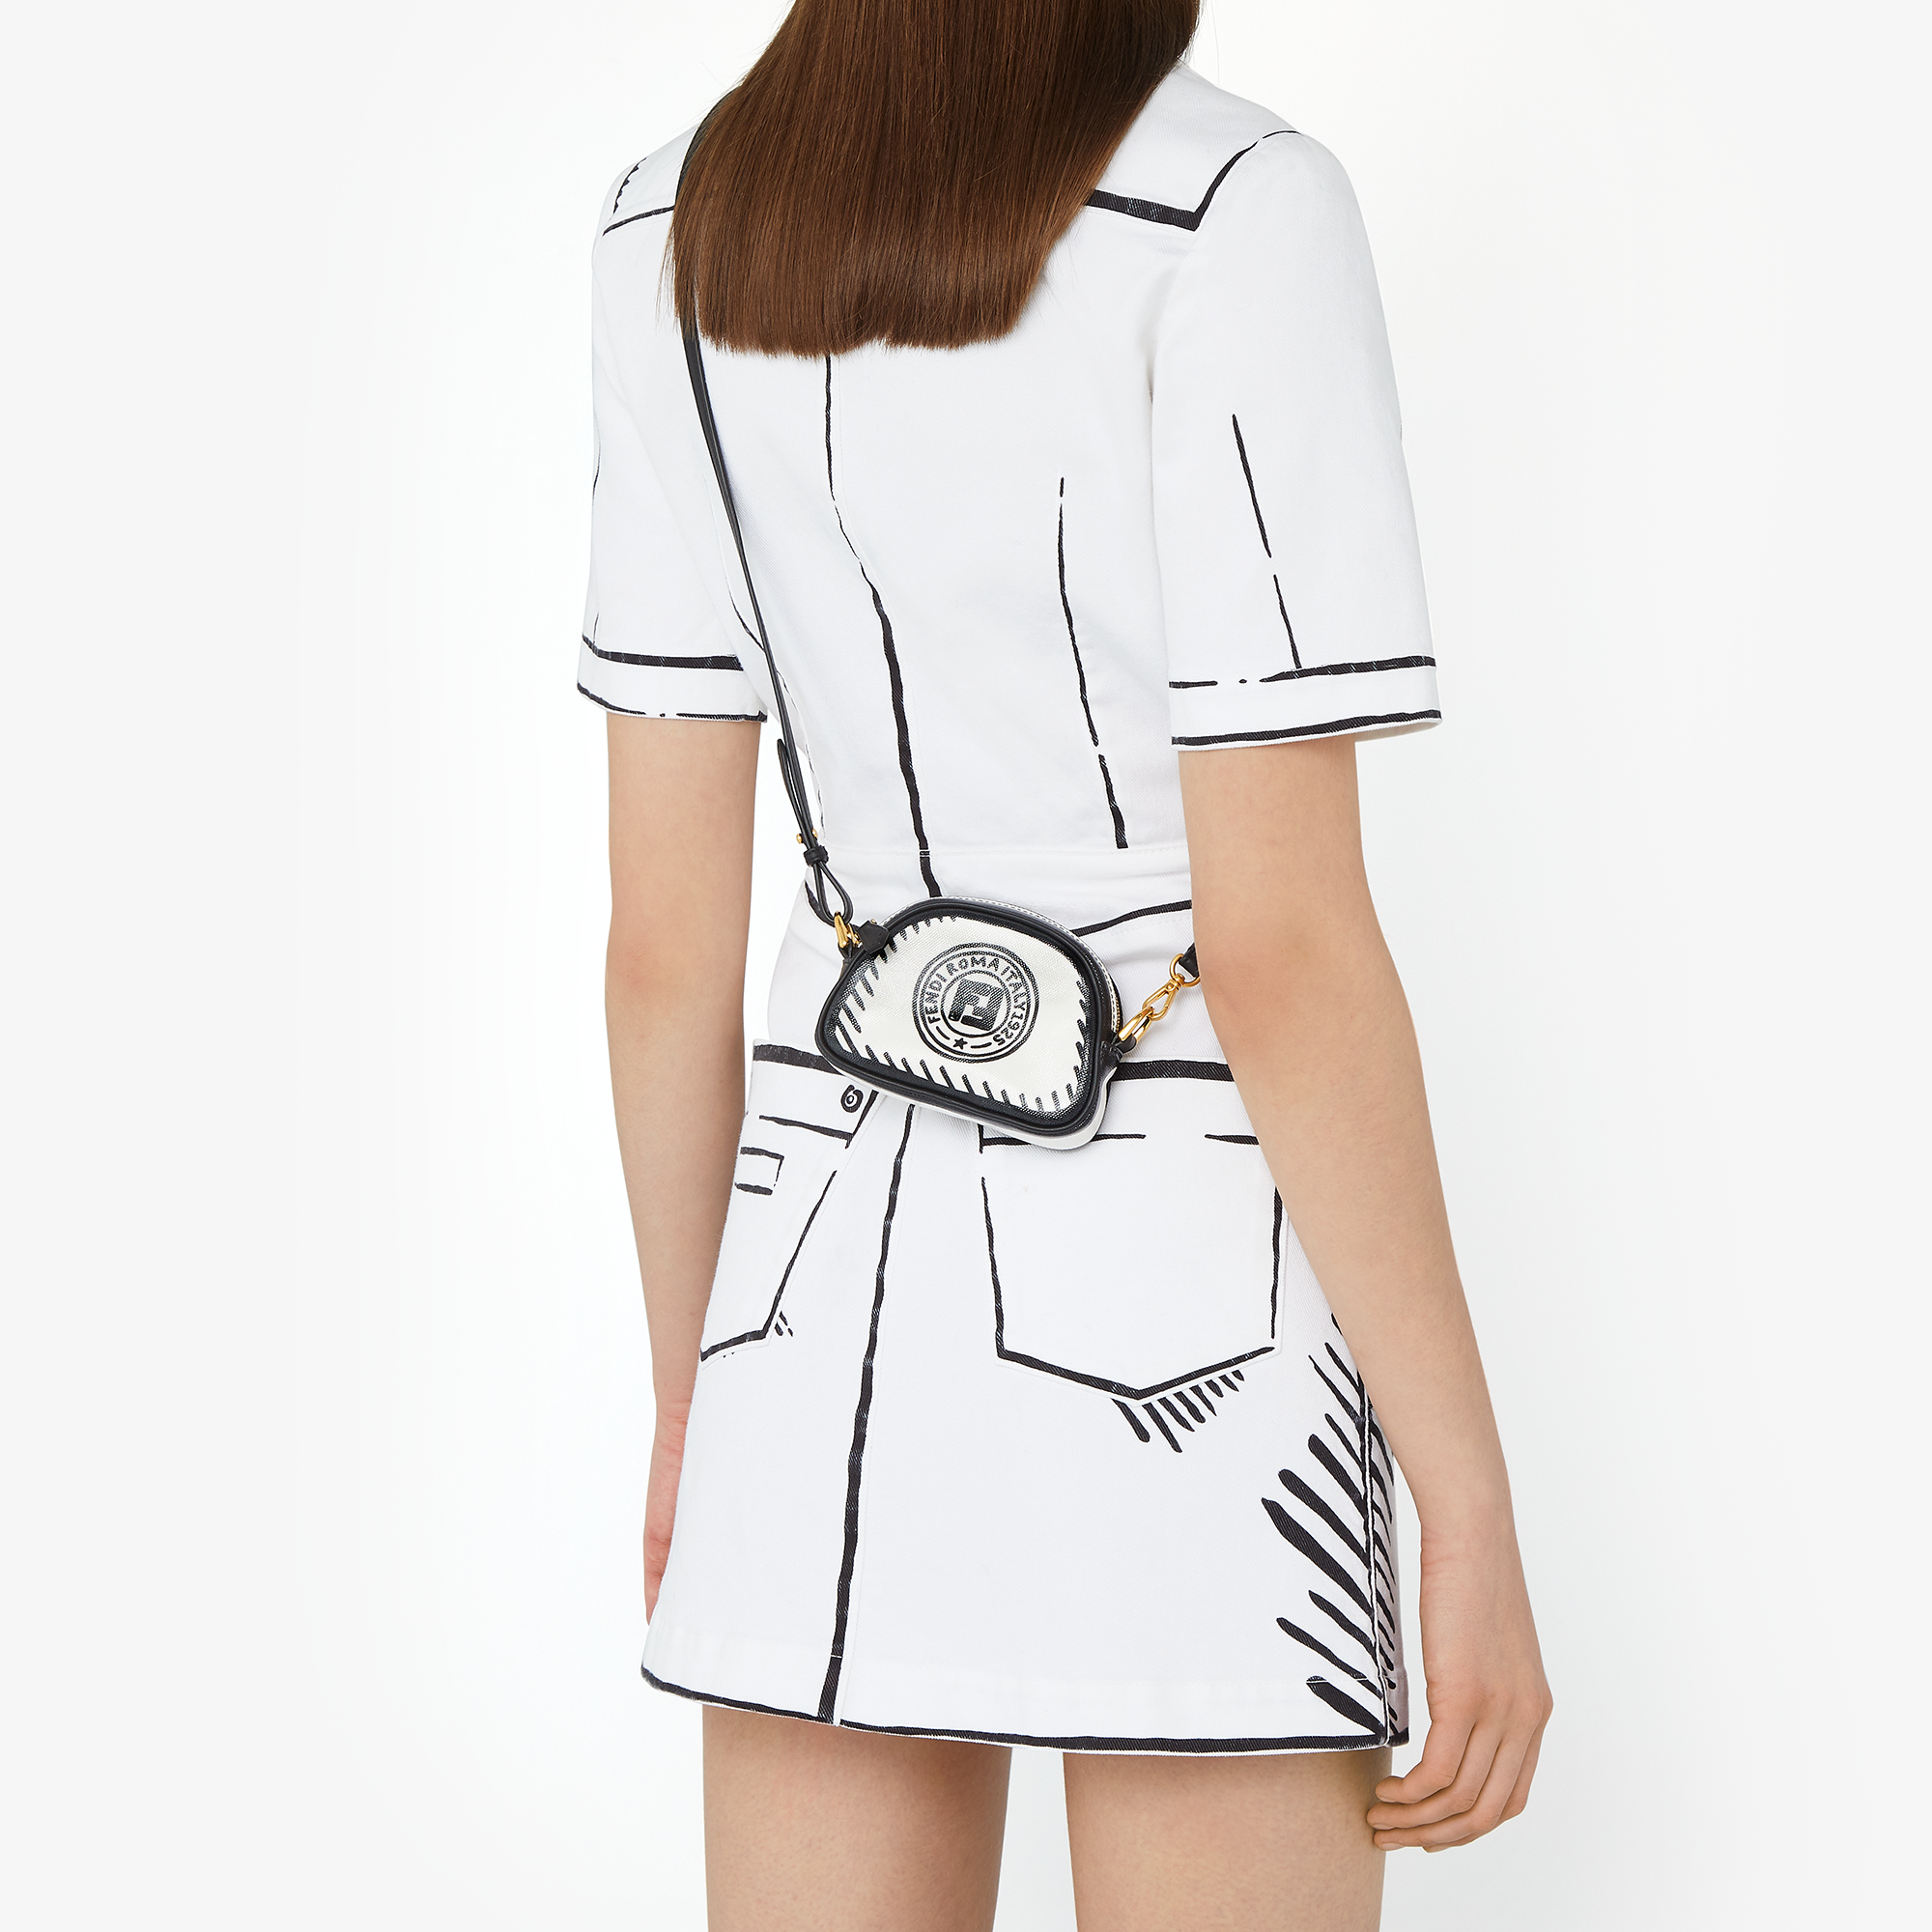 Fendicaliforniasky Fashion Fashion Painting Fashion Brand [ 2000 x 2000 Pixel ]